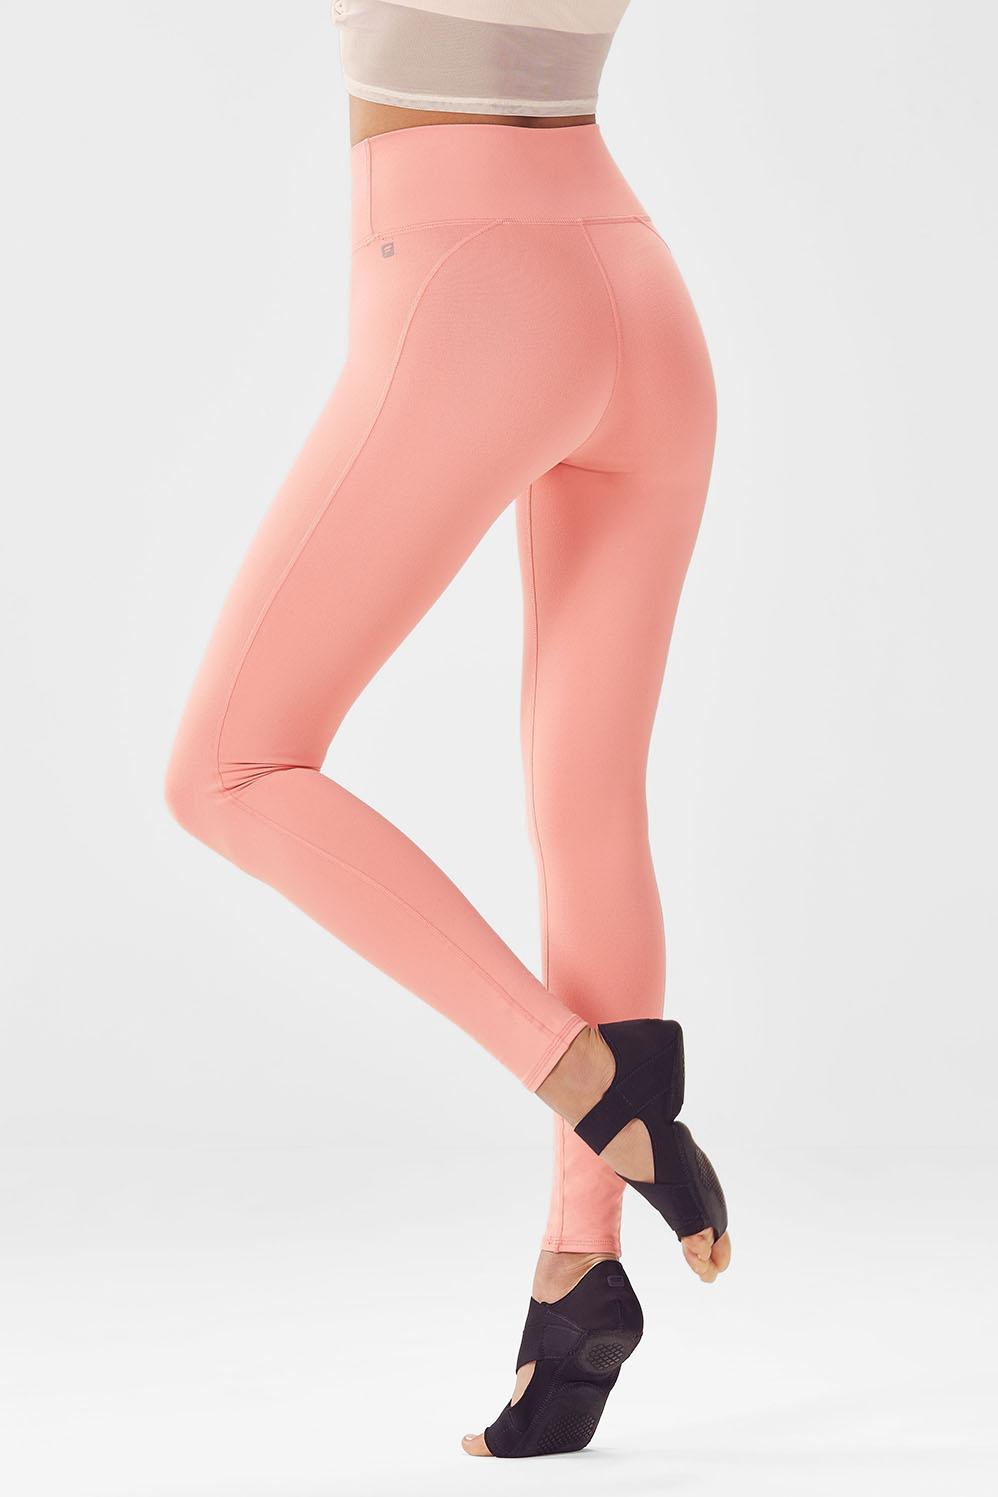 e6bcb4758896e5 High-Waisted Solid PowerHold® Leggings - Fabletics